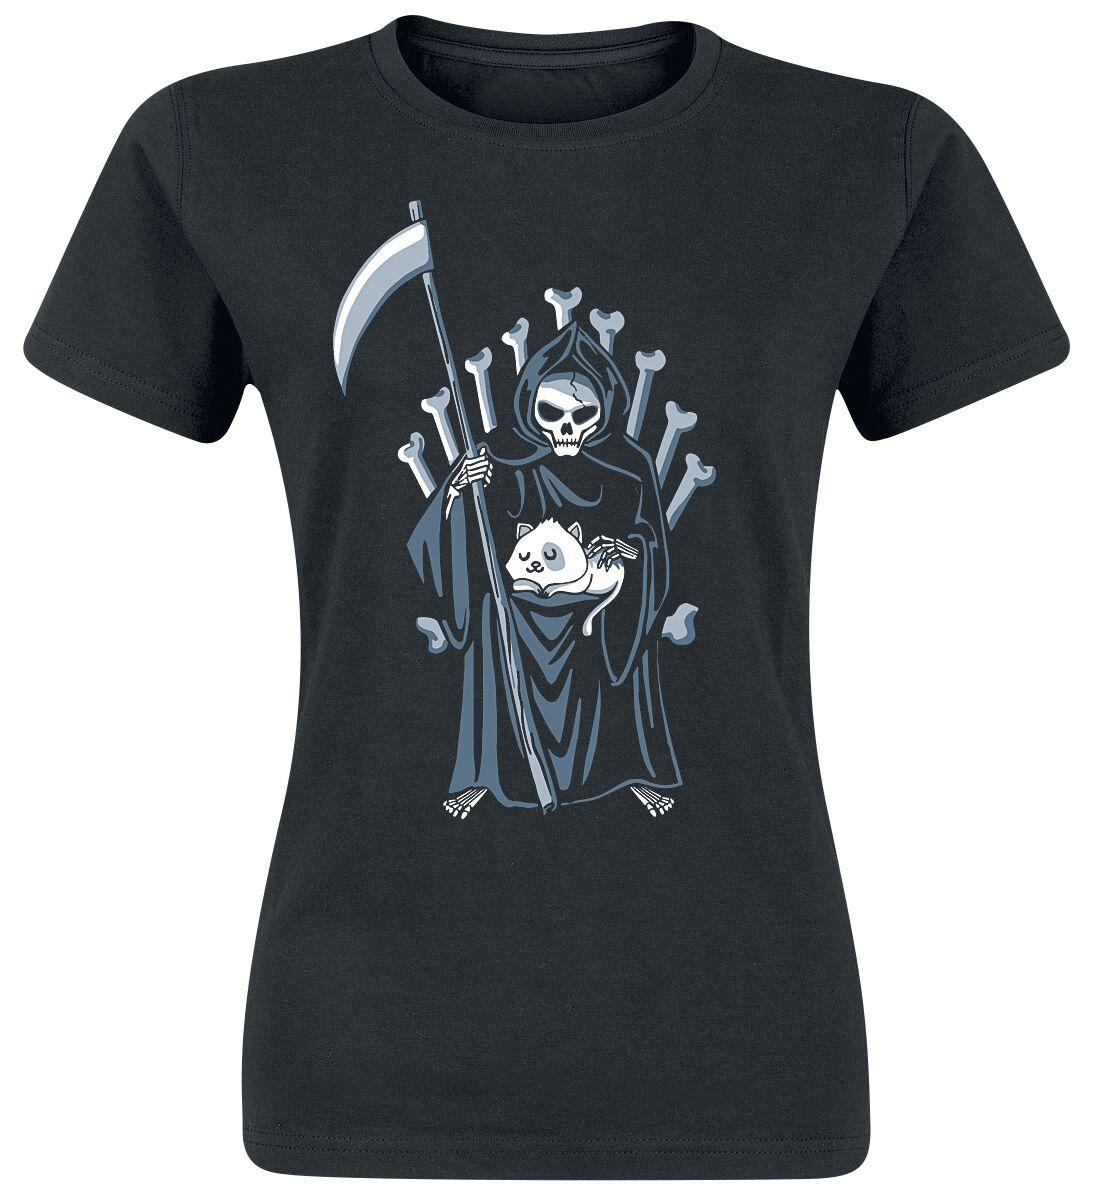 Fun Shirts - Koszulki - Koszulka damska Der Tod und die Katze Koszulka damska czarny - 364451